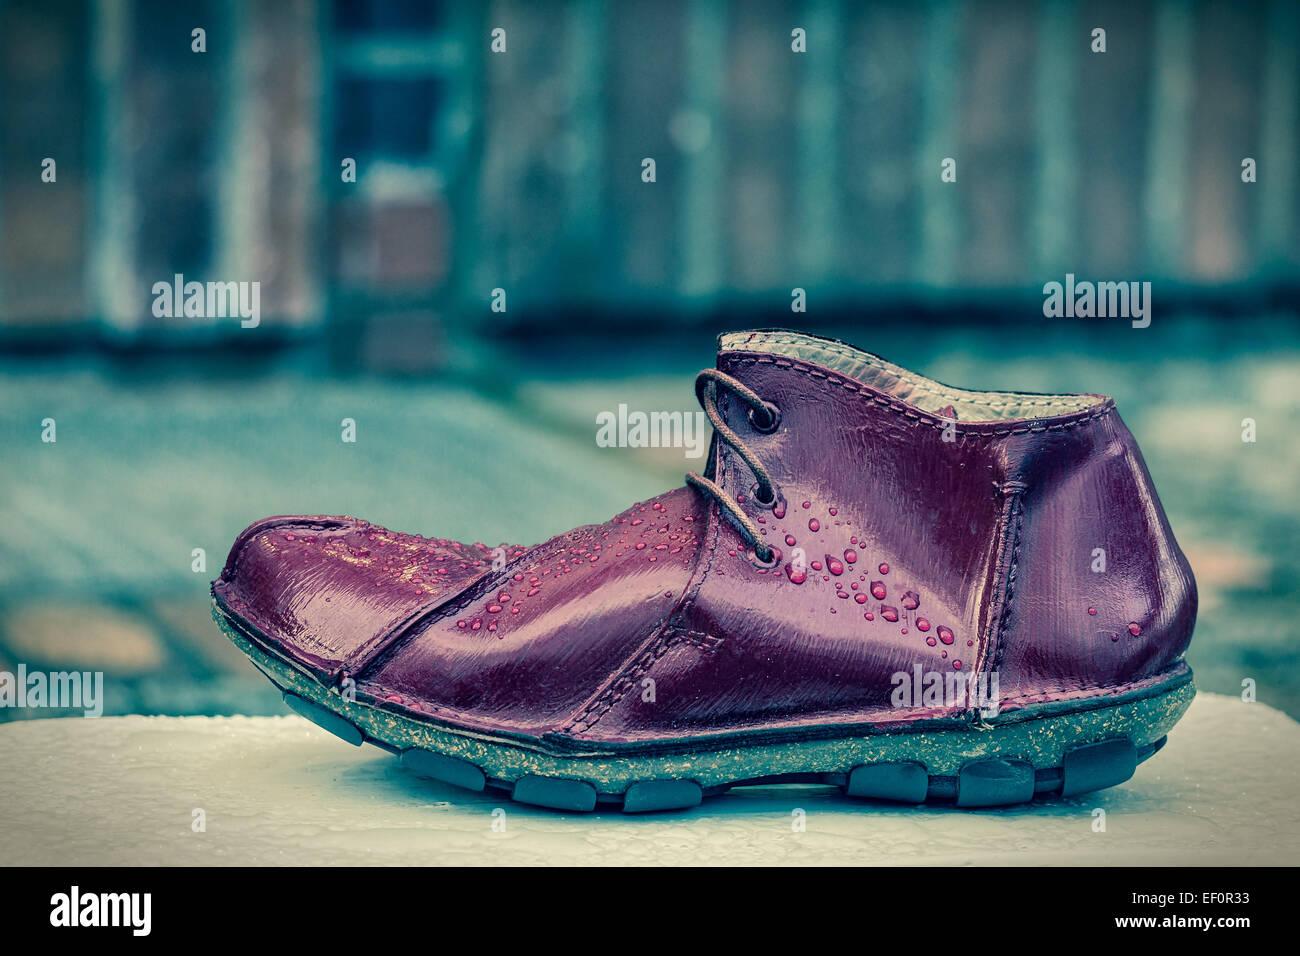 A single shoe. - Stock Image